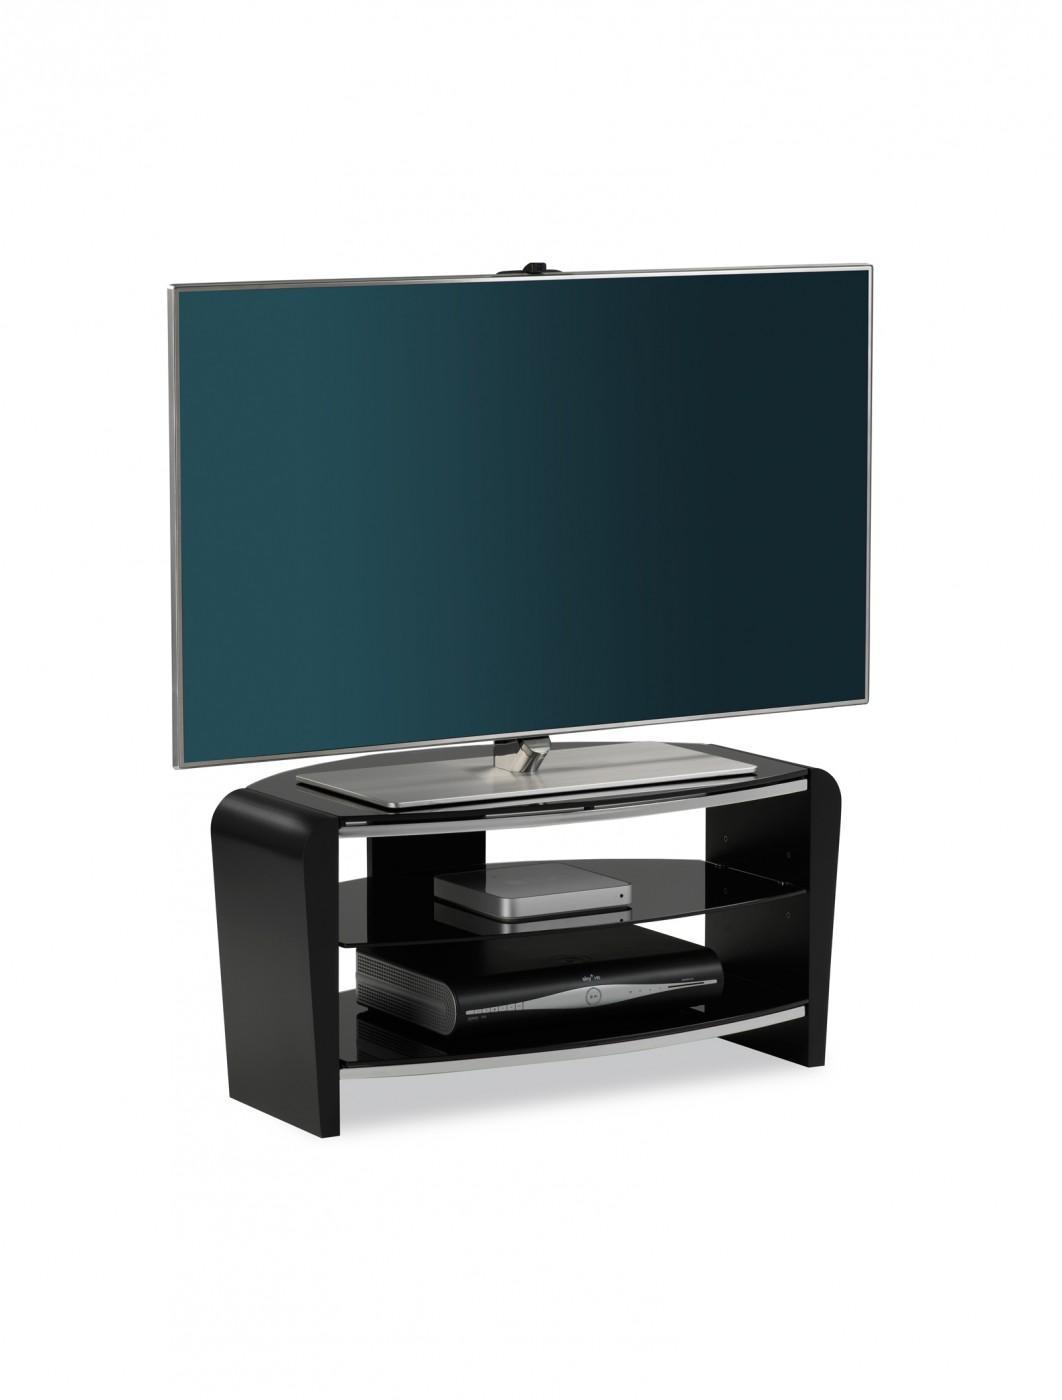 alphason frn800 3blk bk francium tv stand